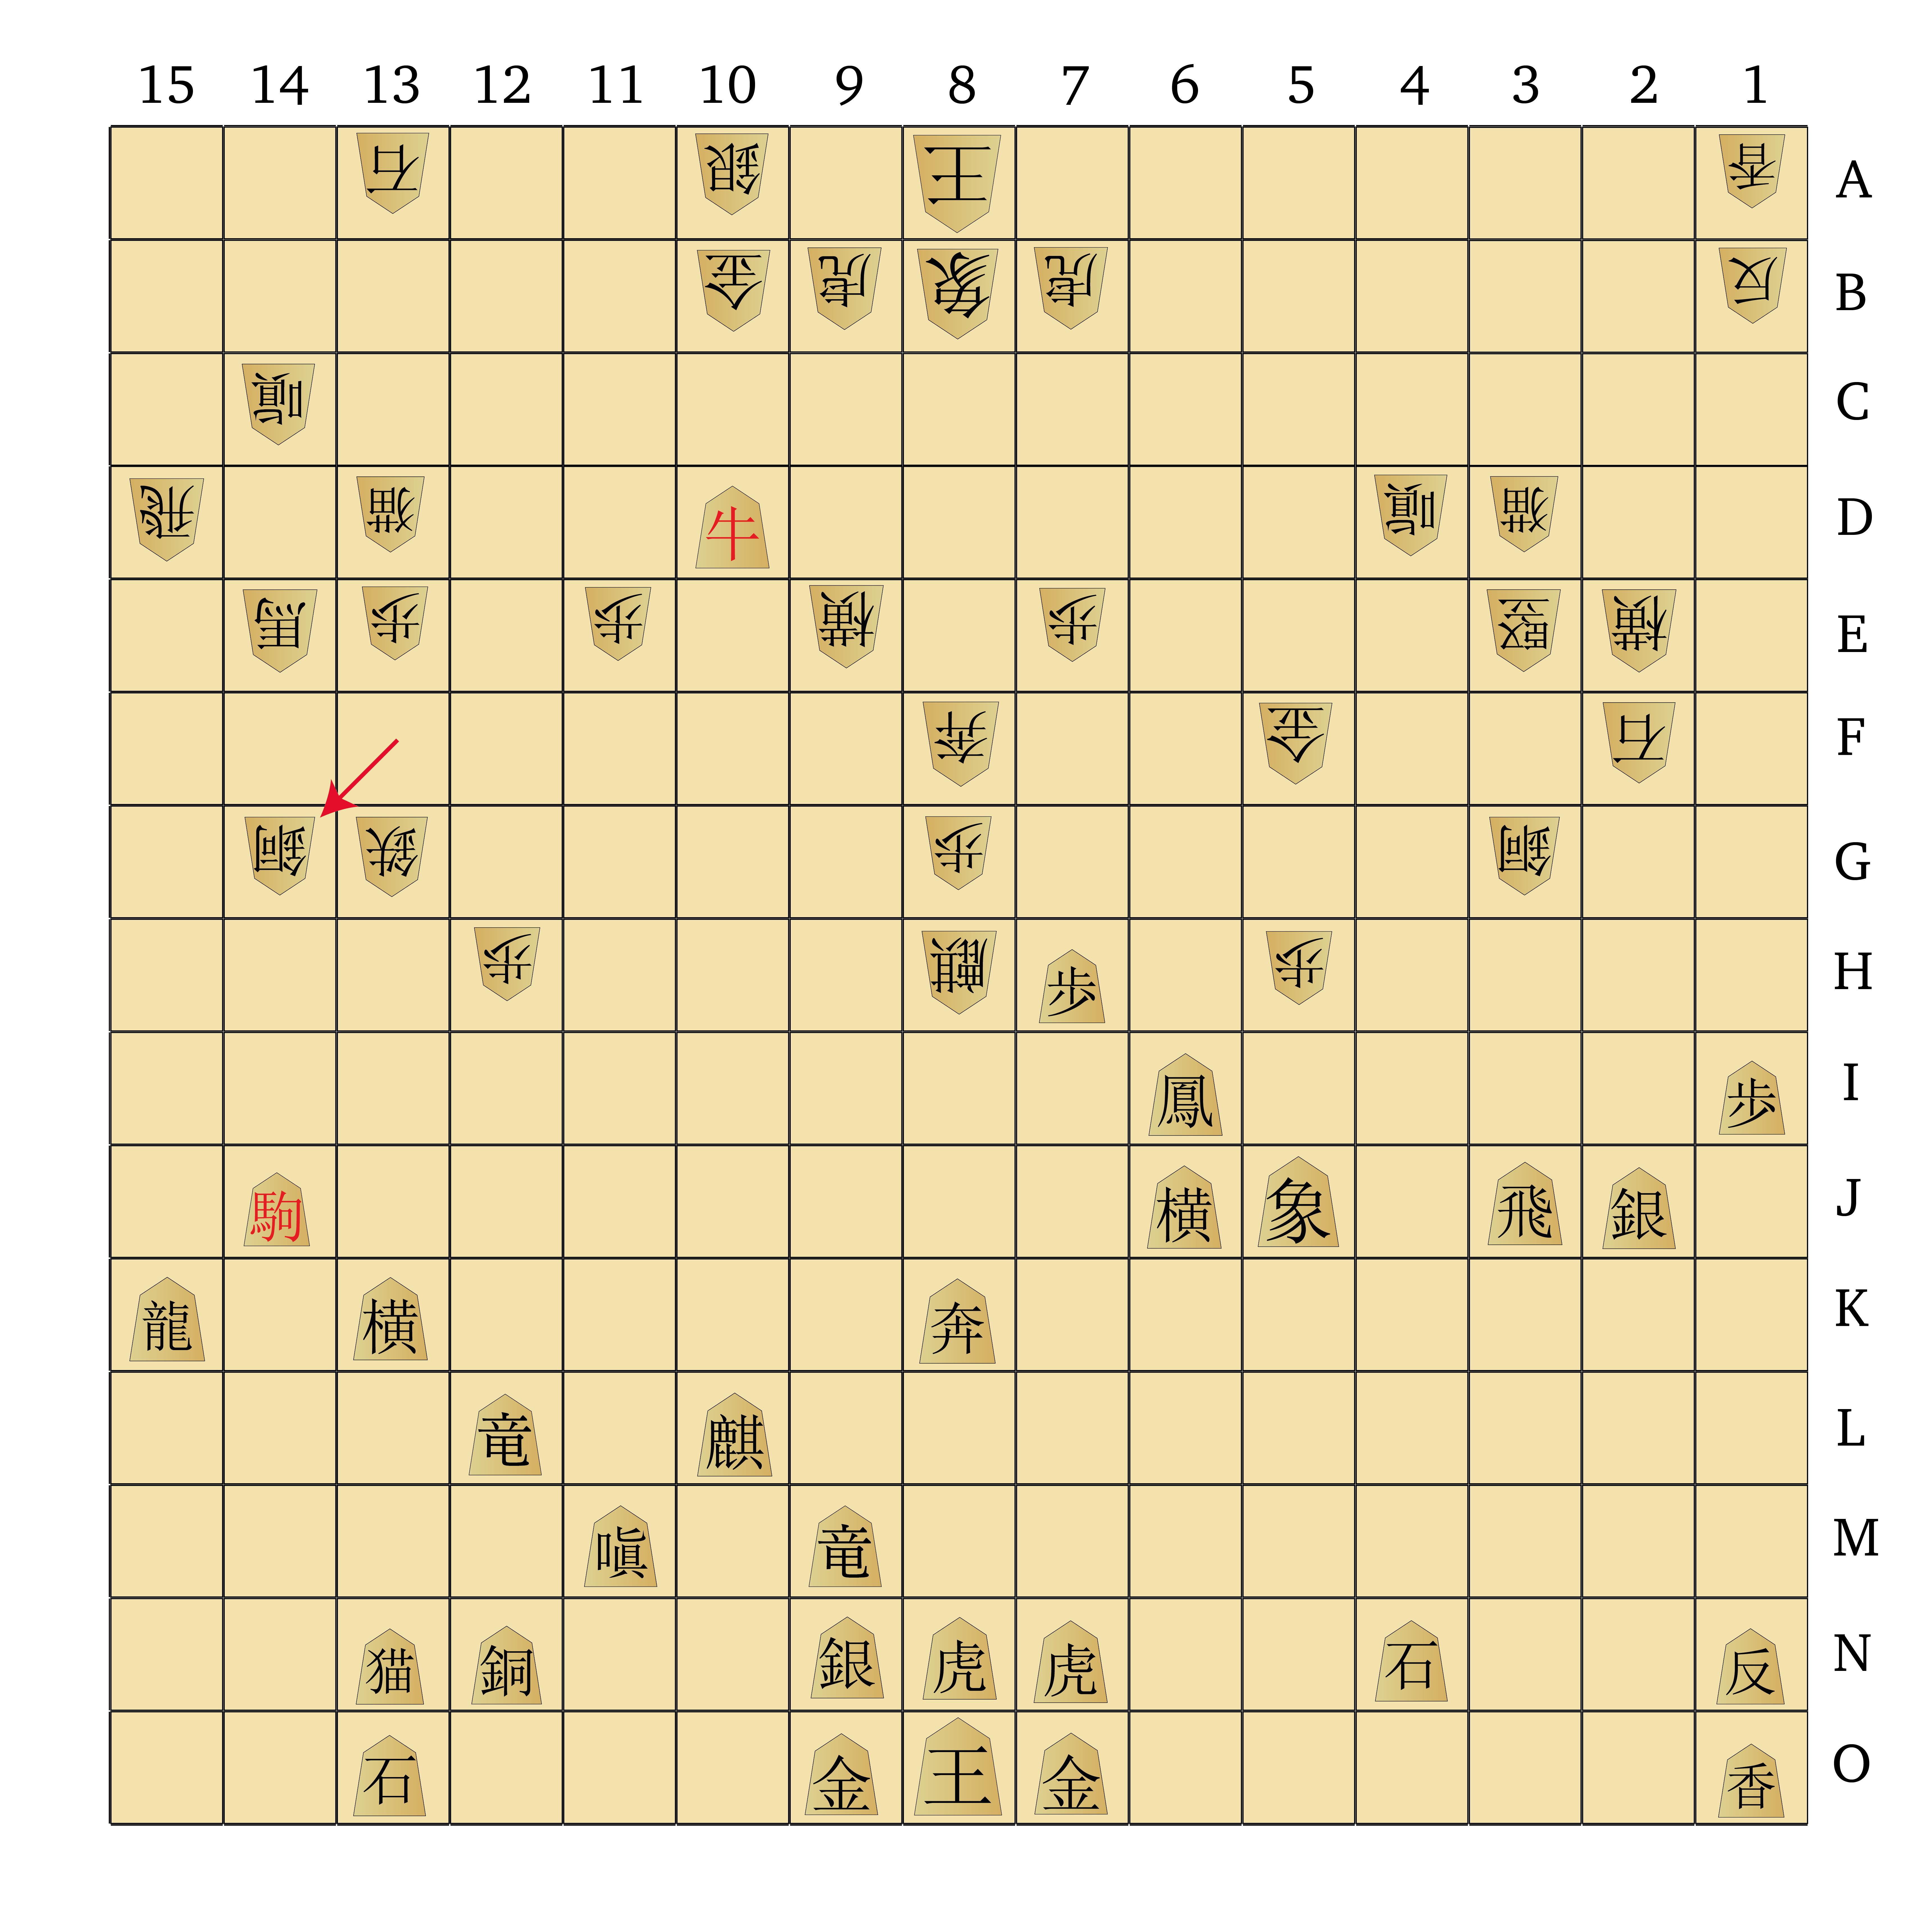 Dai Shogi 420 -- Move 420-01